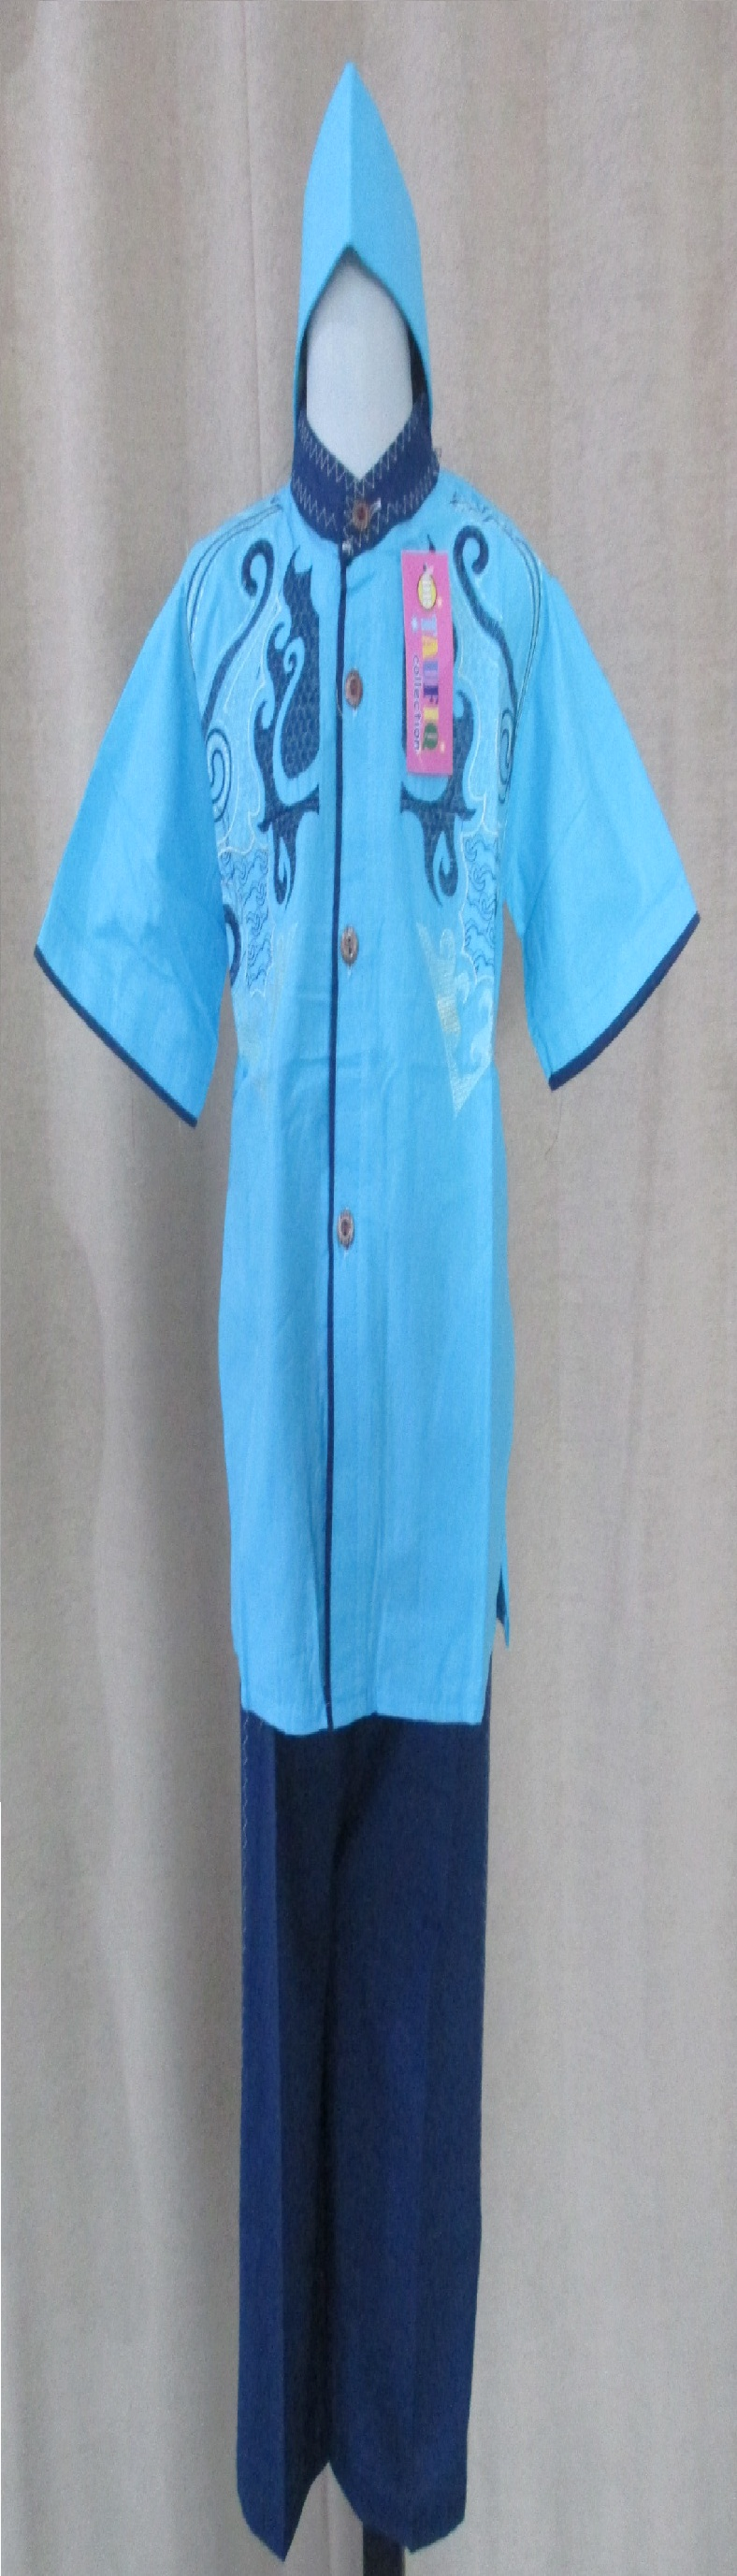 Baju Koko Toufiq murah